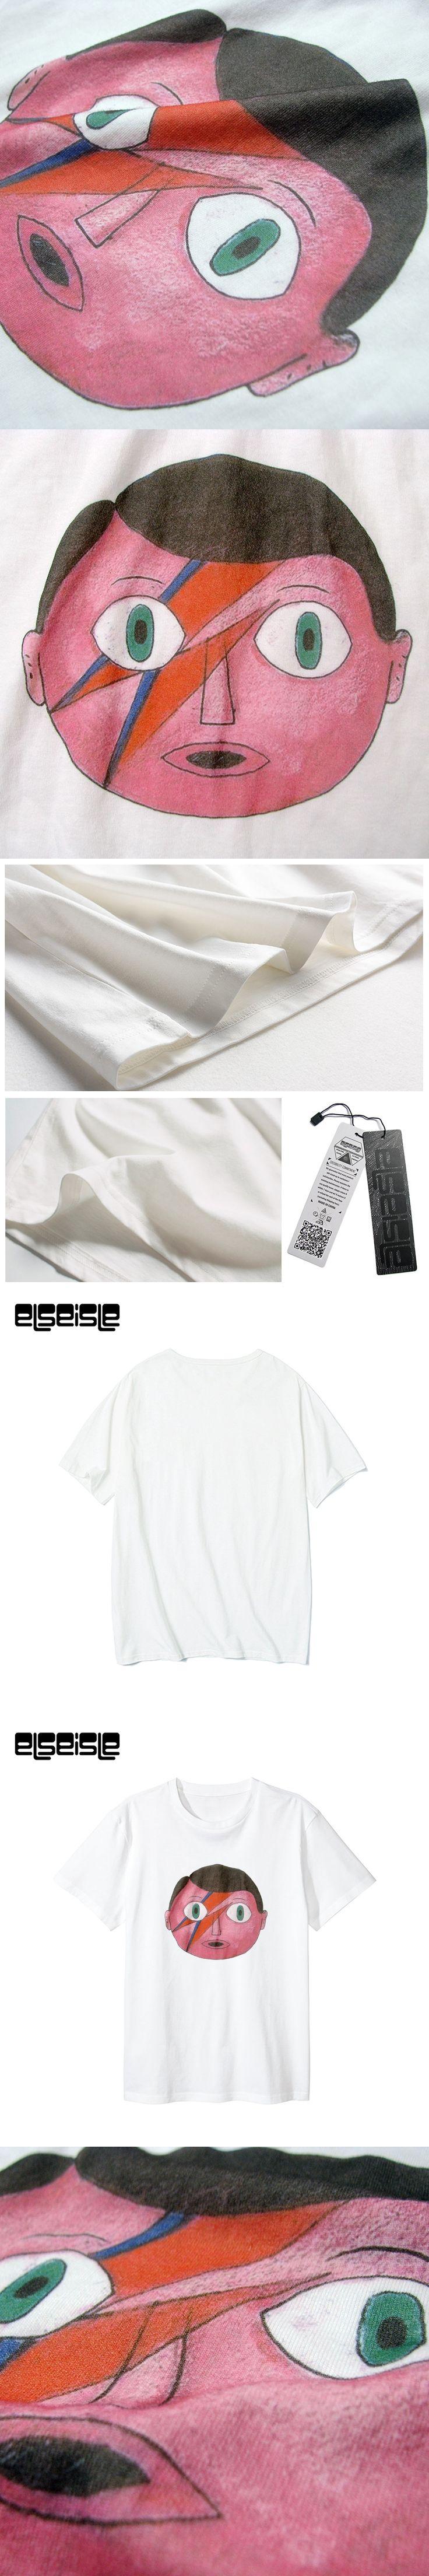 Anime figure paint mask Frank movie t shirt movie art funny t shirt male clothing brand t-shirt elseisle pop culture t shirt men